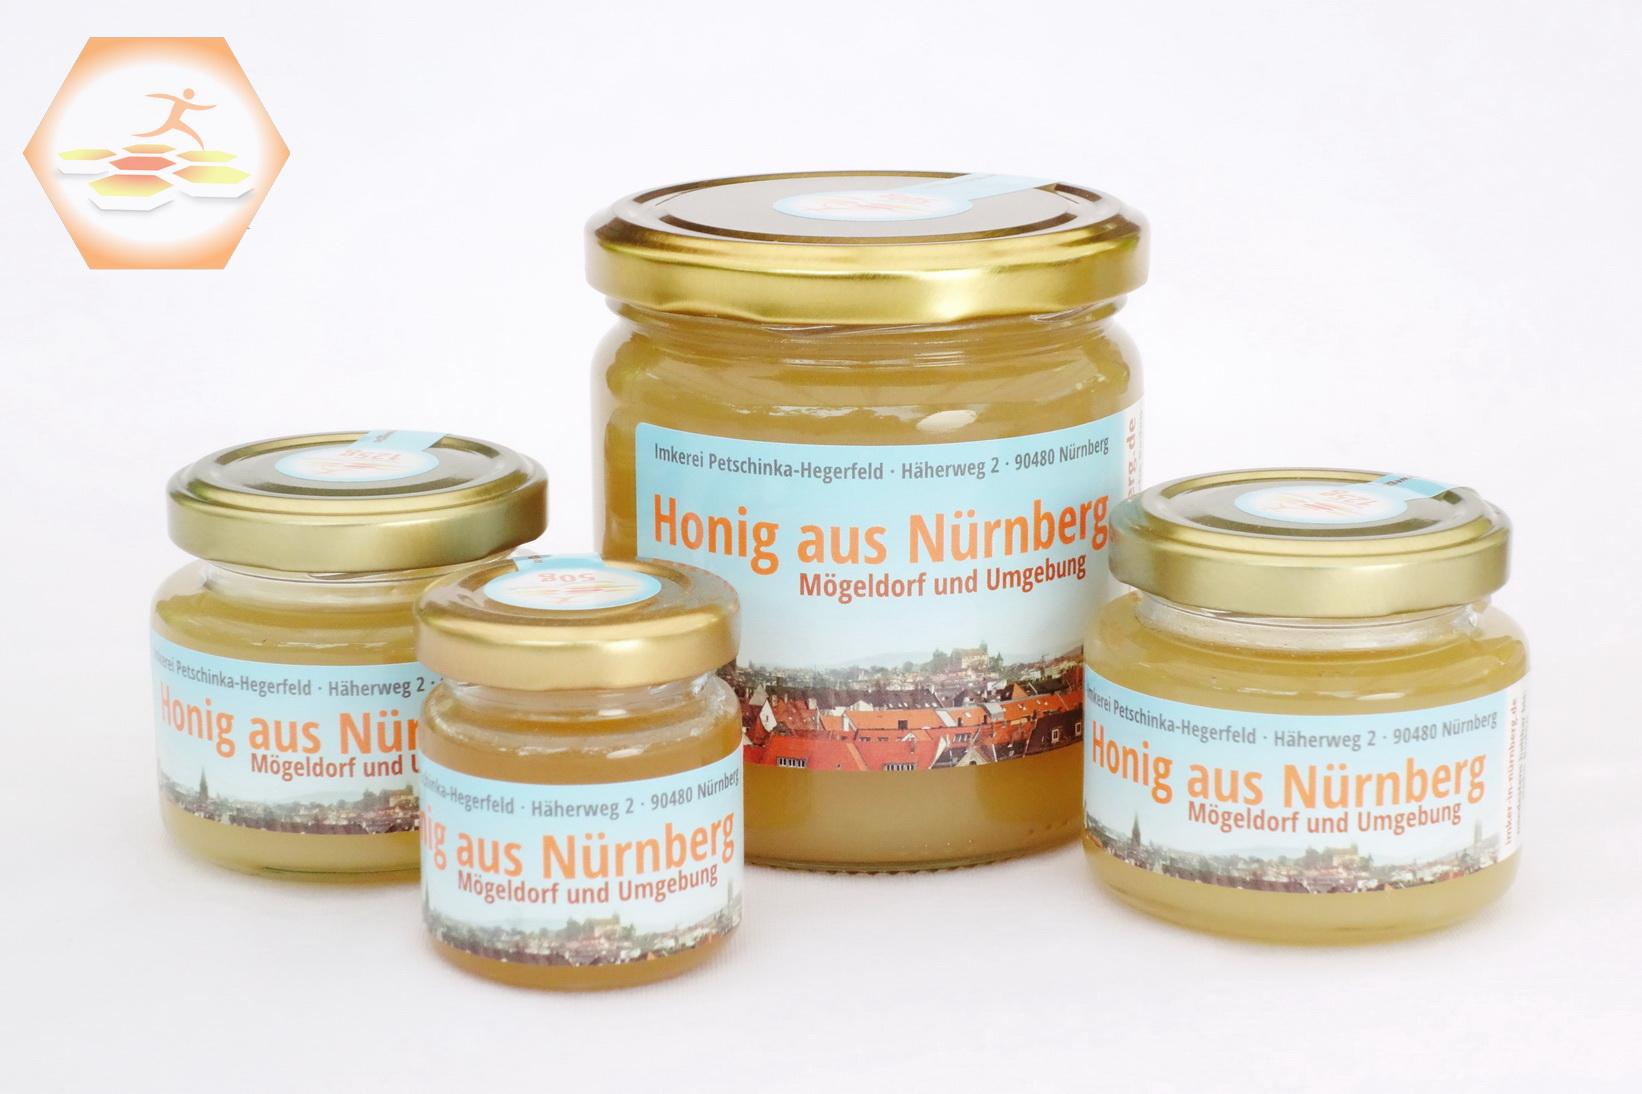 Honig aus Nürnberg Mögeldorf und Umgebung